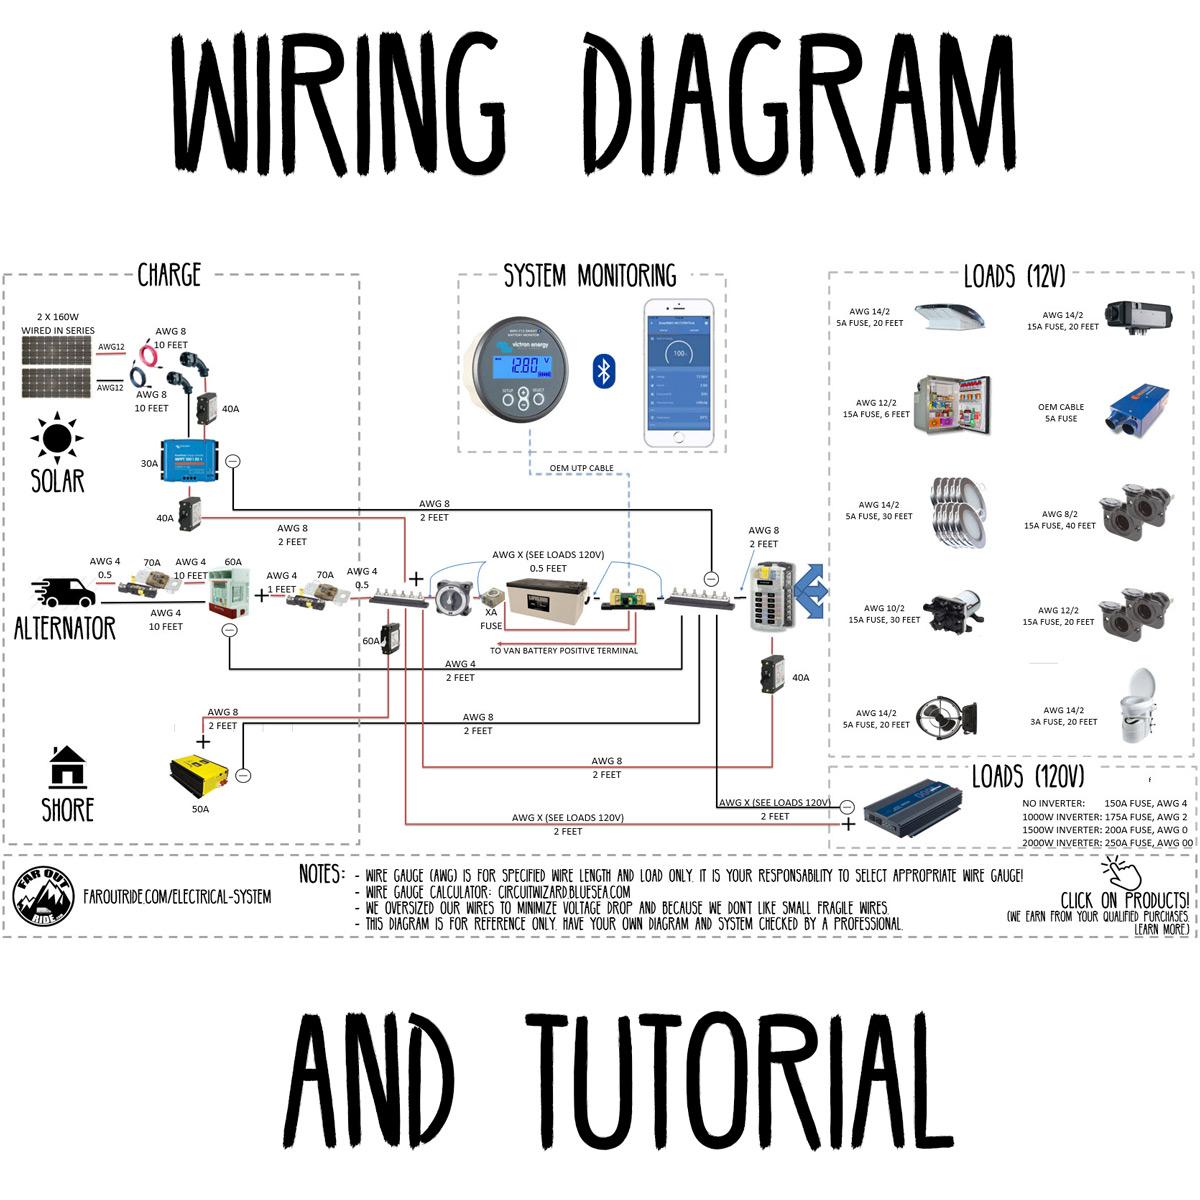 Intercity Product Wiring Diagram Wire Center \u2022 Furnace Fan Diagram  Intercity Furnace Wiring Diagram